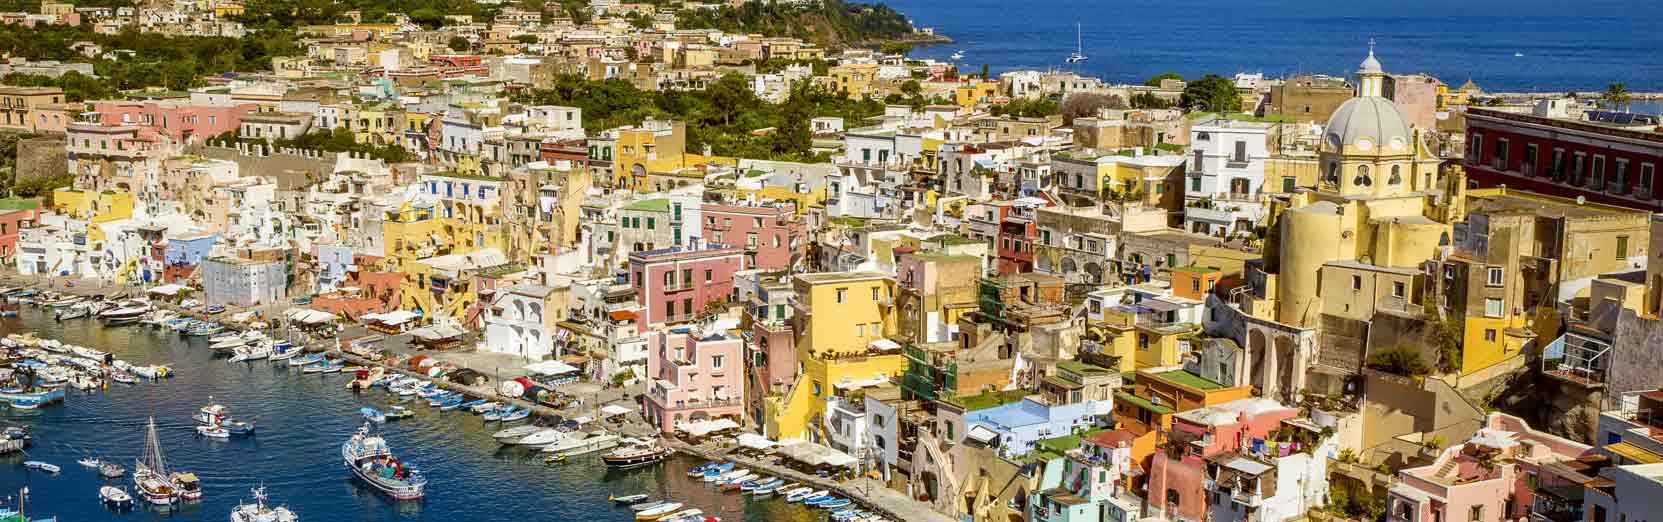 Neapel Rundreise Auf Tour Sunny Cars Autovermietung